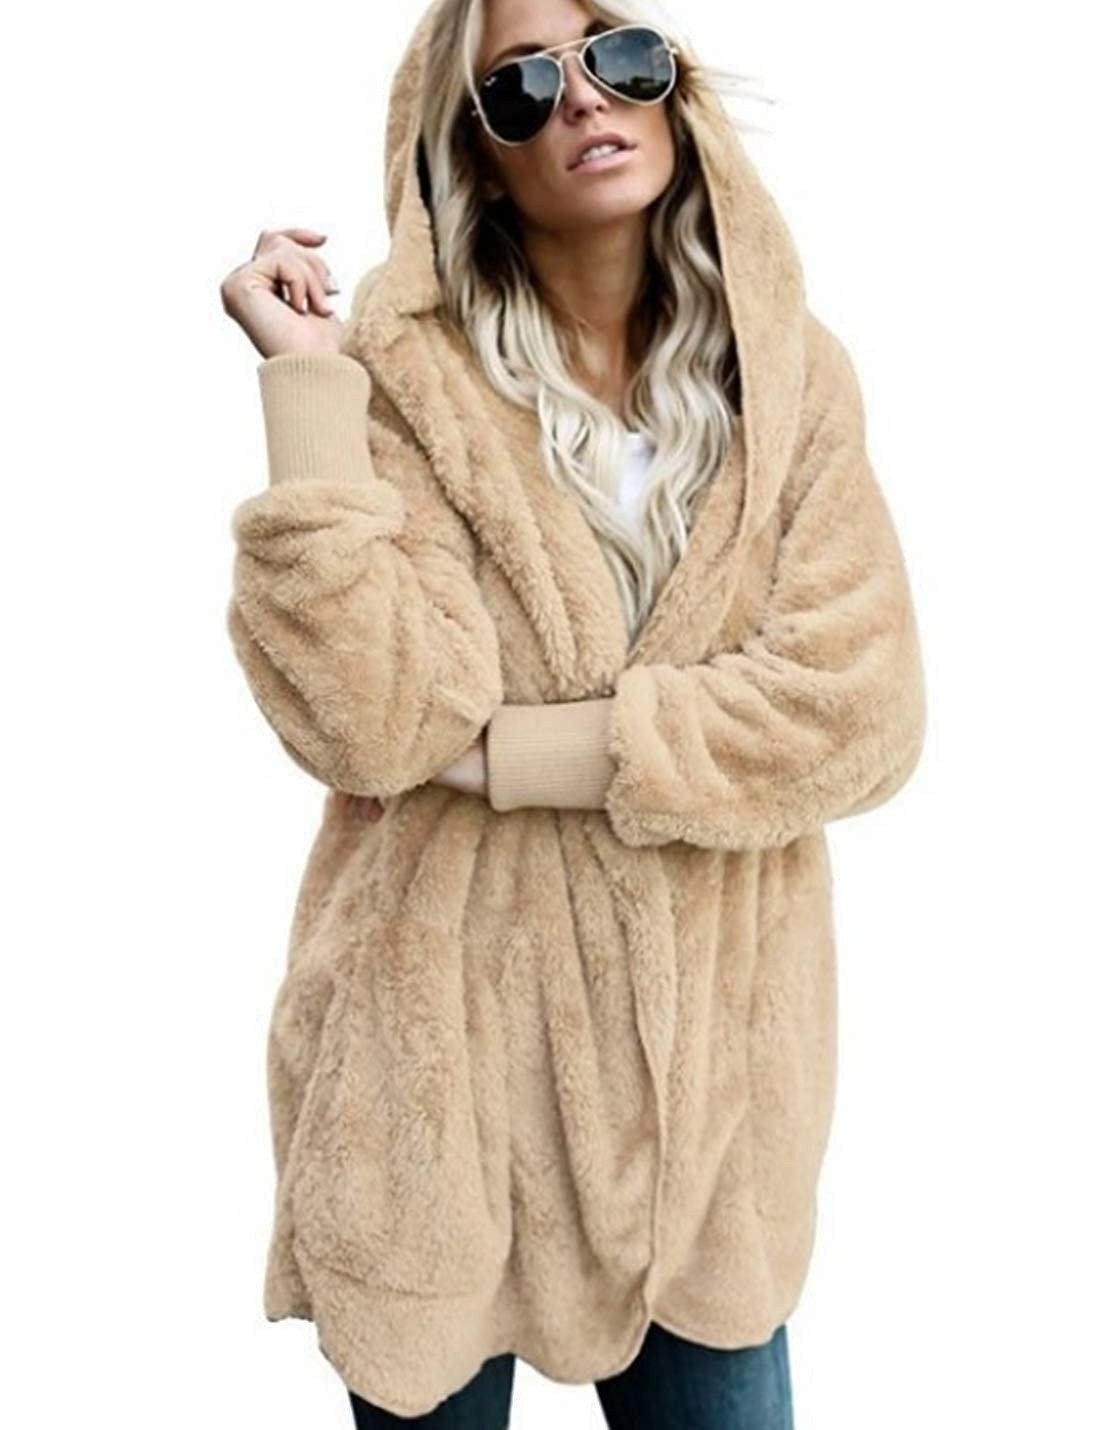 Naliha Fuzzy Sweater Cardigan Coat Hoodie Womens Casual Faux Fur Jacket Outerwear